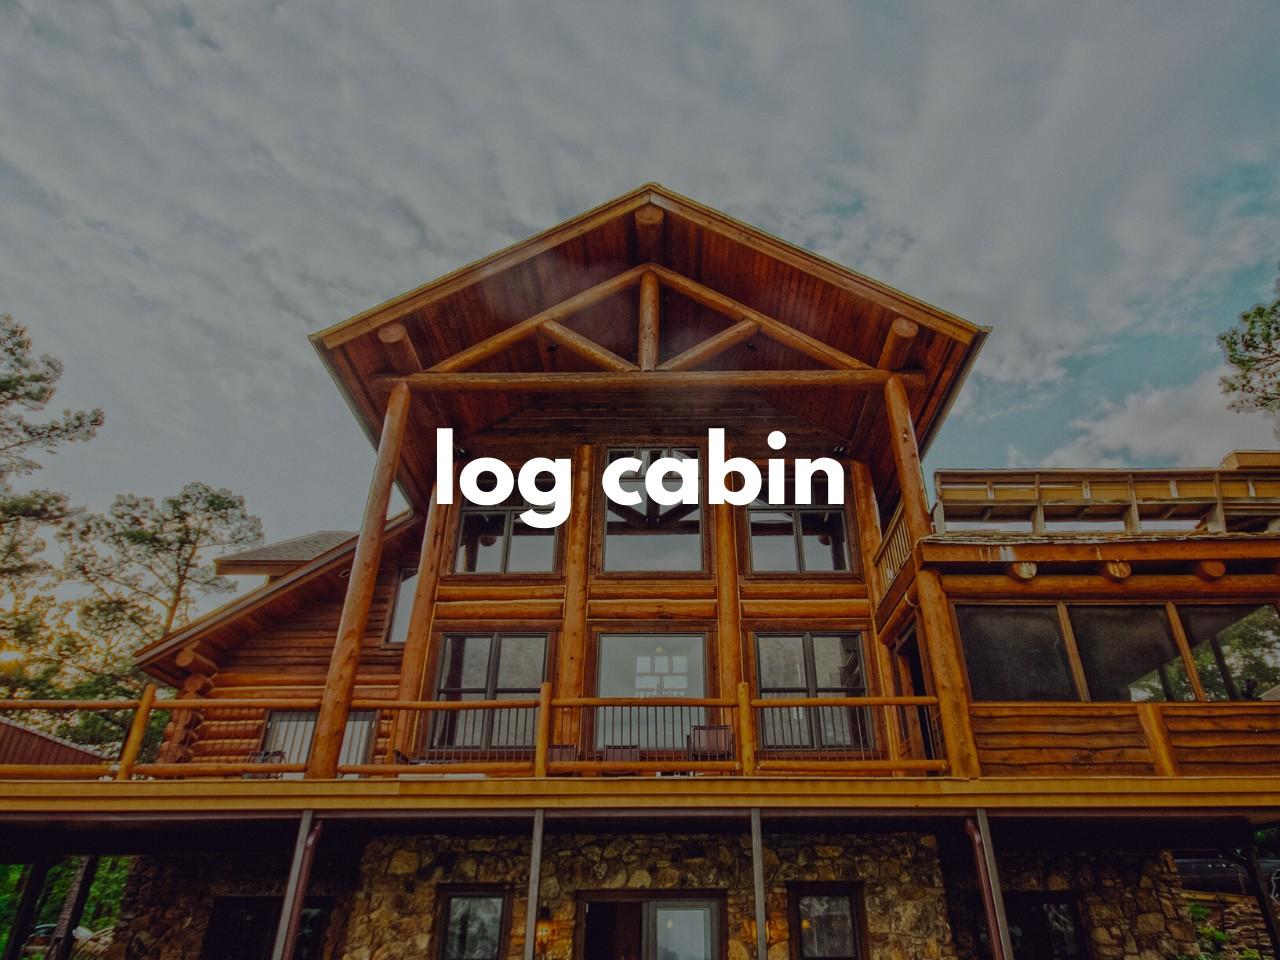 lodge : log cabin : 丸太小屋